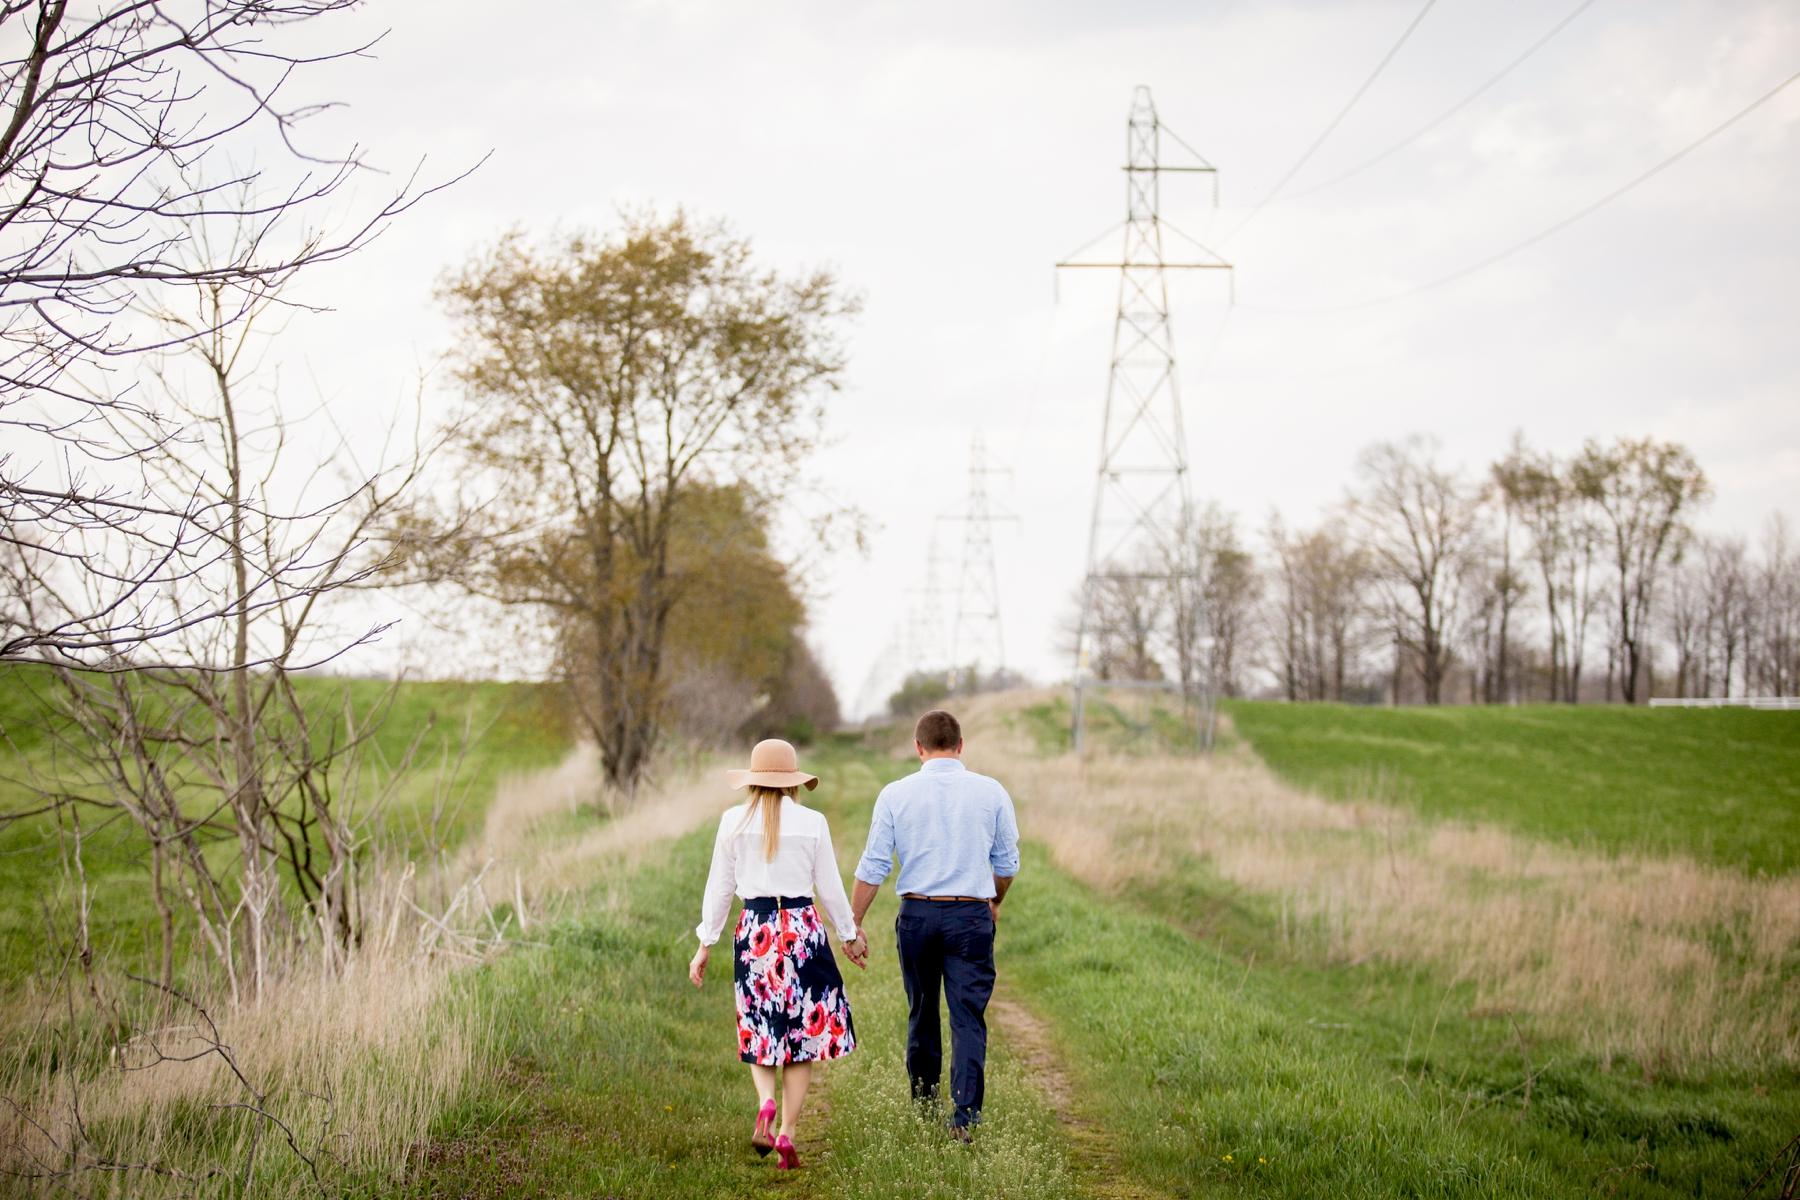 Brandon_Shafer_Photography_Shane_Ashley_Greenhouse_Farm_Michigan_Engagement_0013.jpg